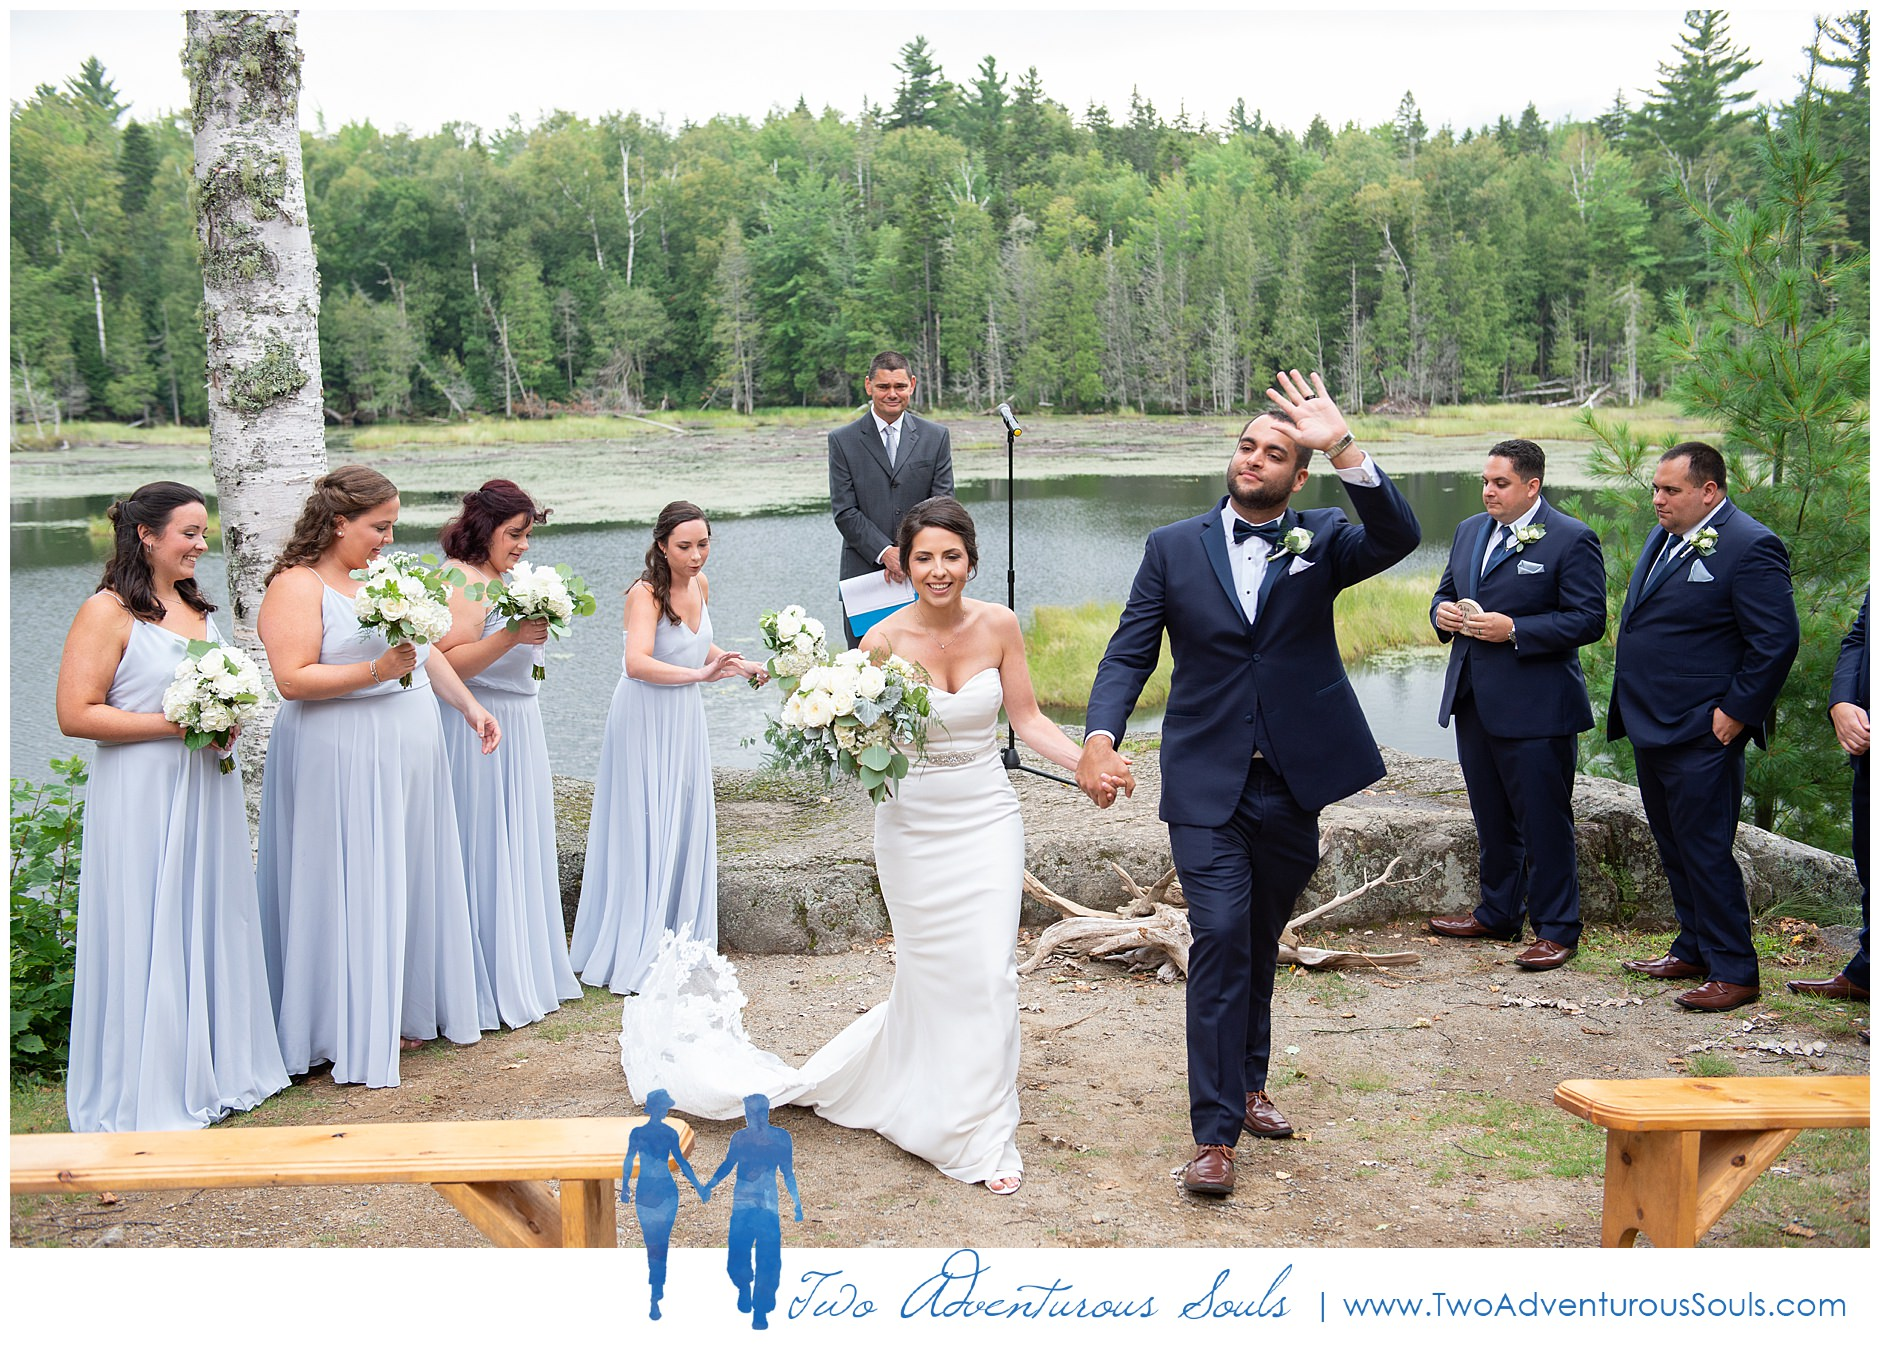 Sugarloaf Outdoor Center Wedding Photographers, Destination Wedding Photographers, Two Adventurous Souls-081719_0044.jpg